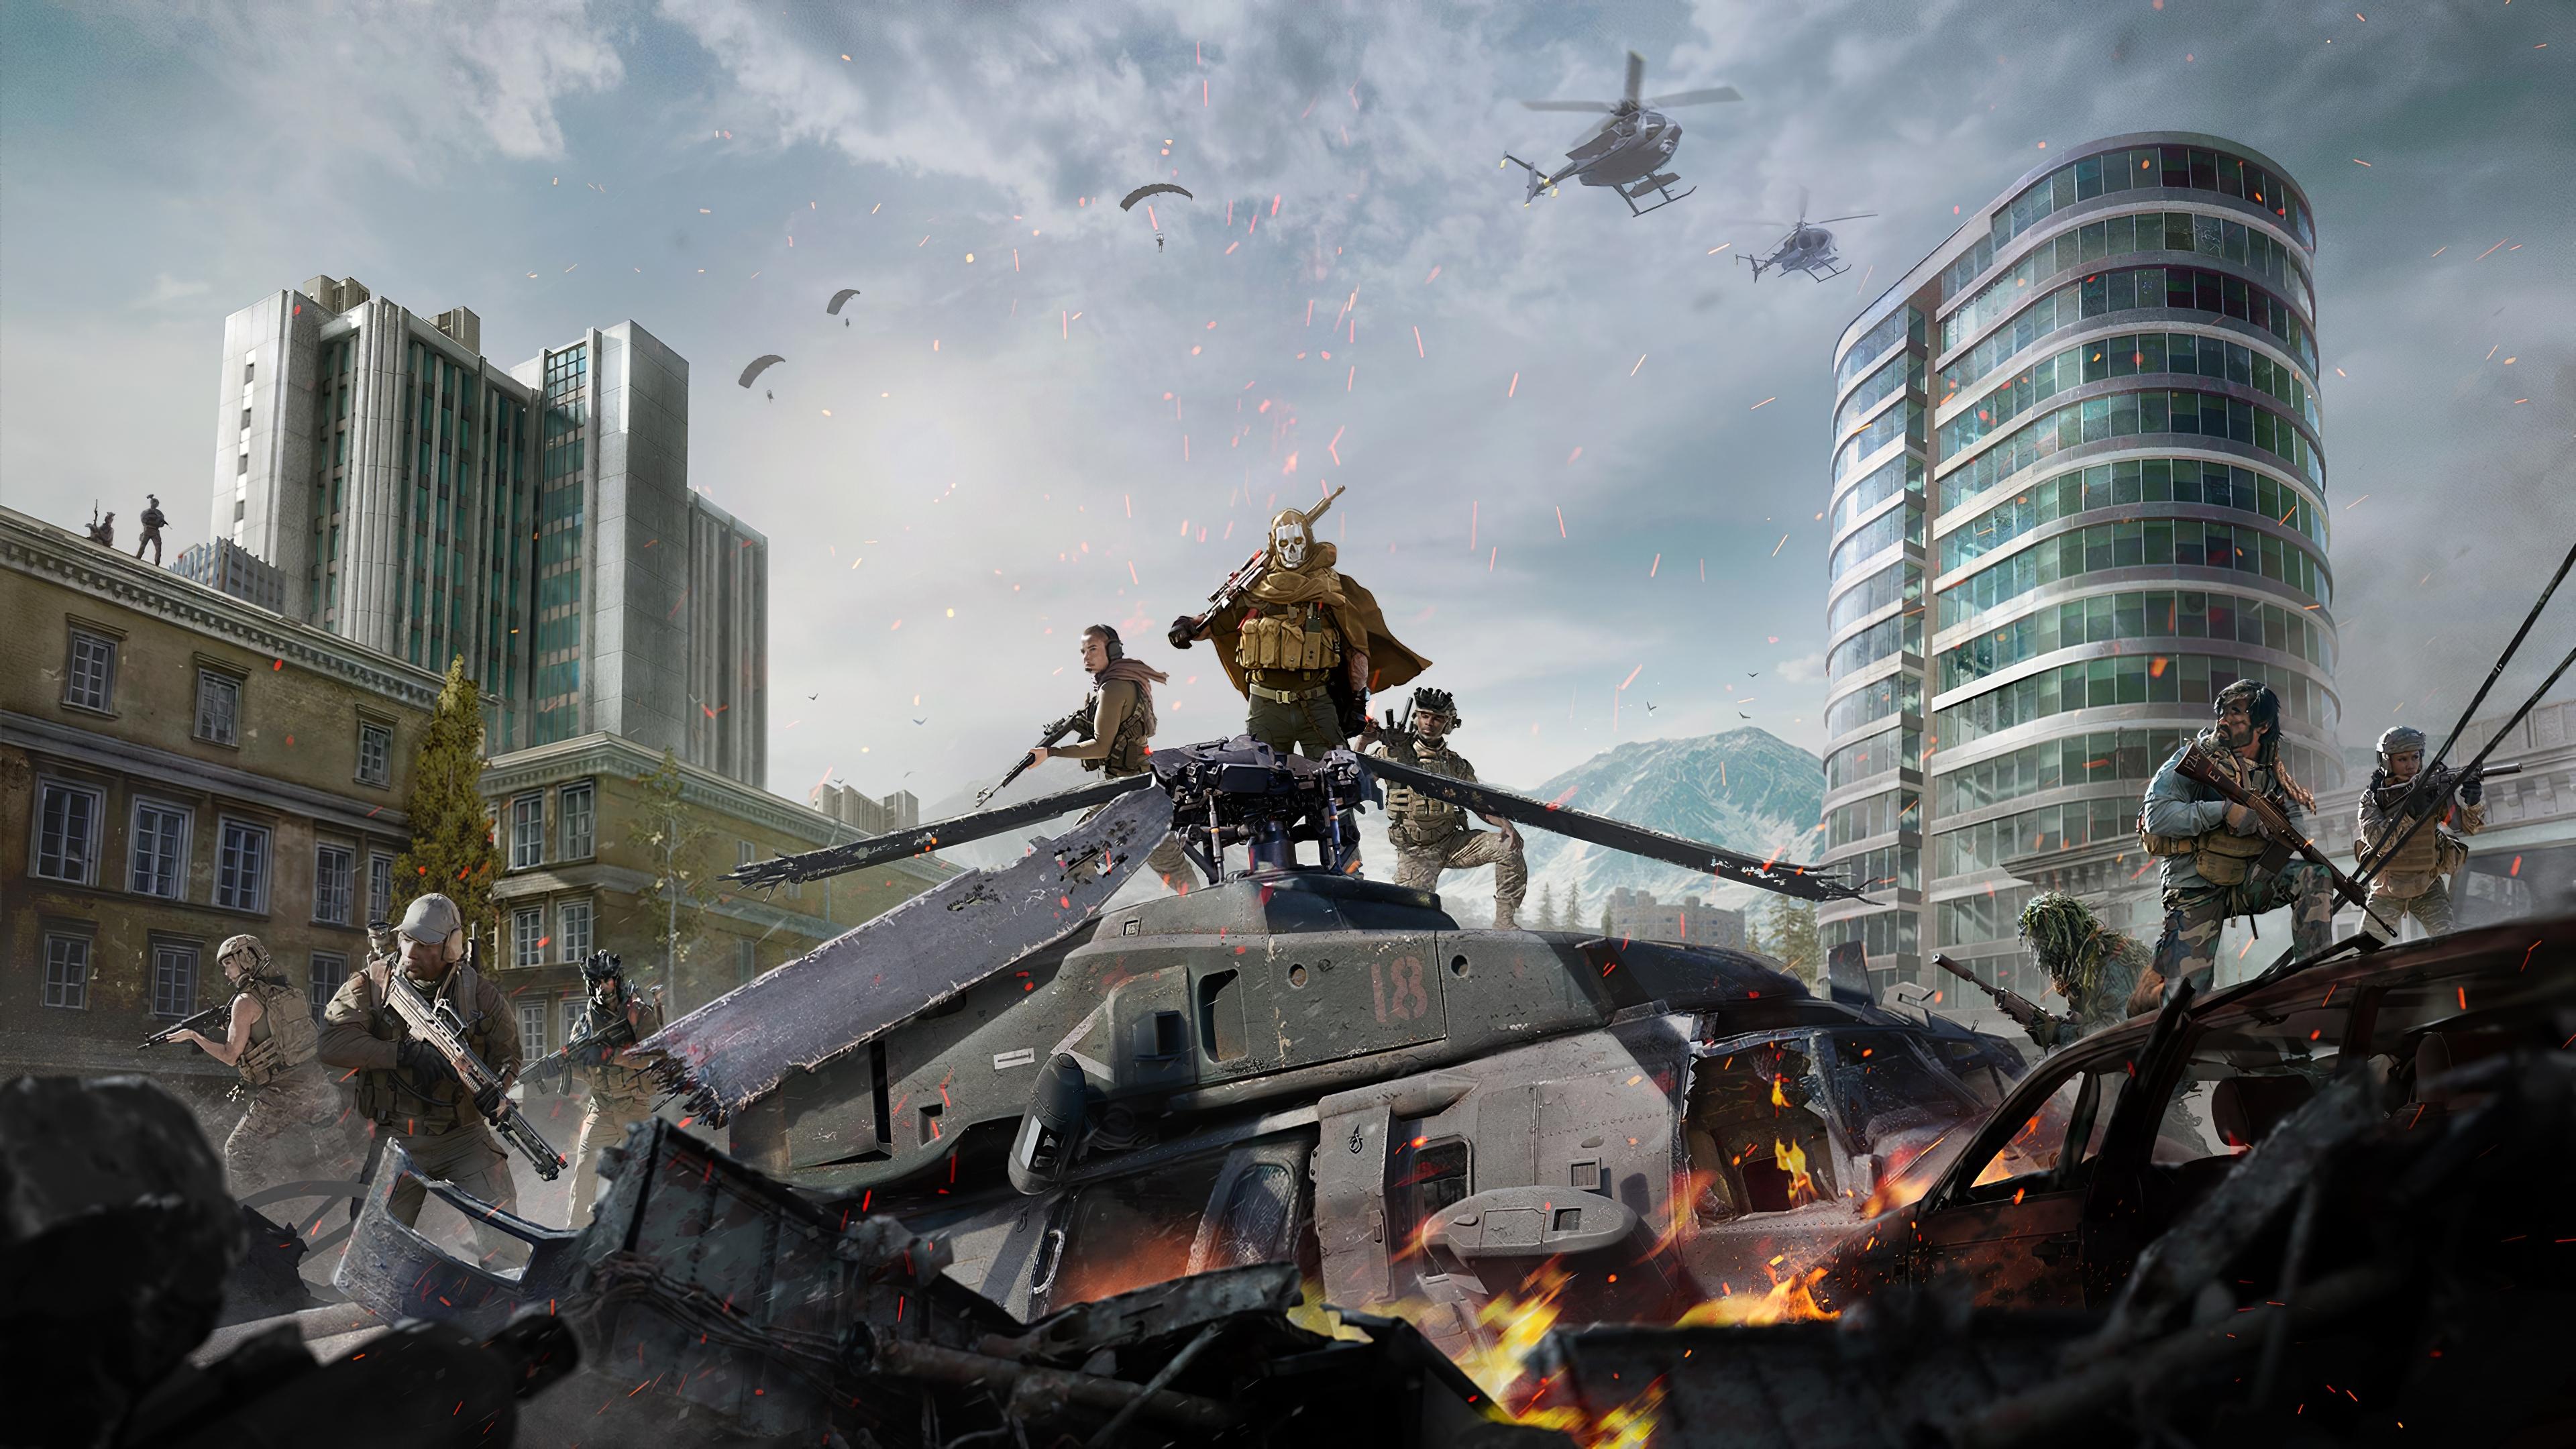 call of duty warzone 1589580309 - Call Of Duty Warzone - Call Of Duty Warzone wallpapers, Call Of Duty Warzone 4k wallpapers